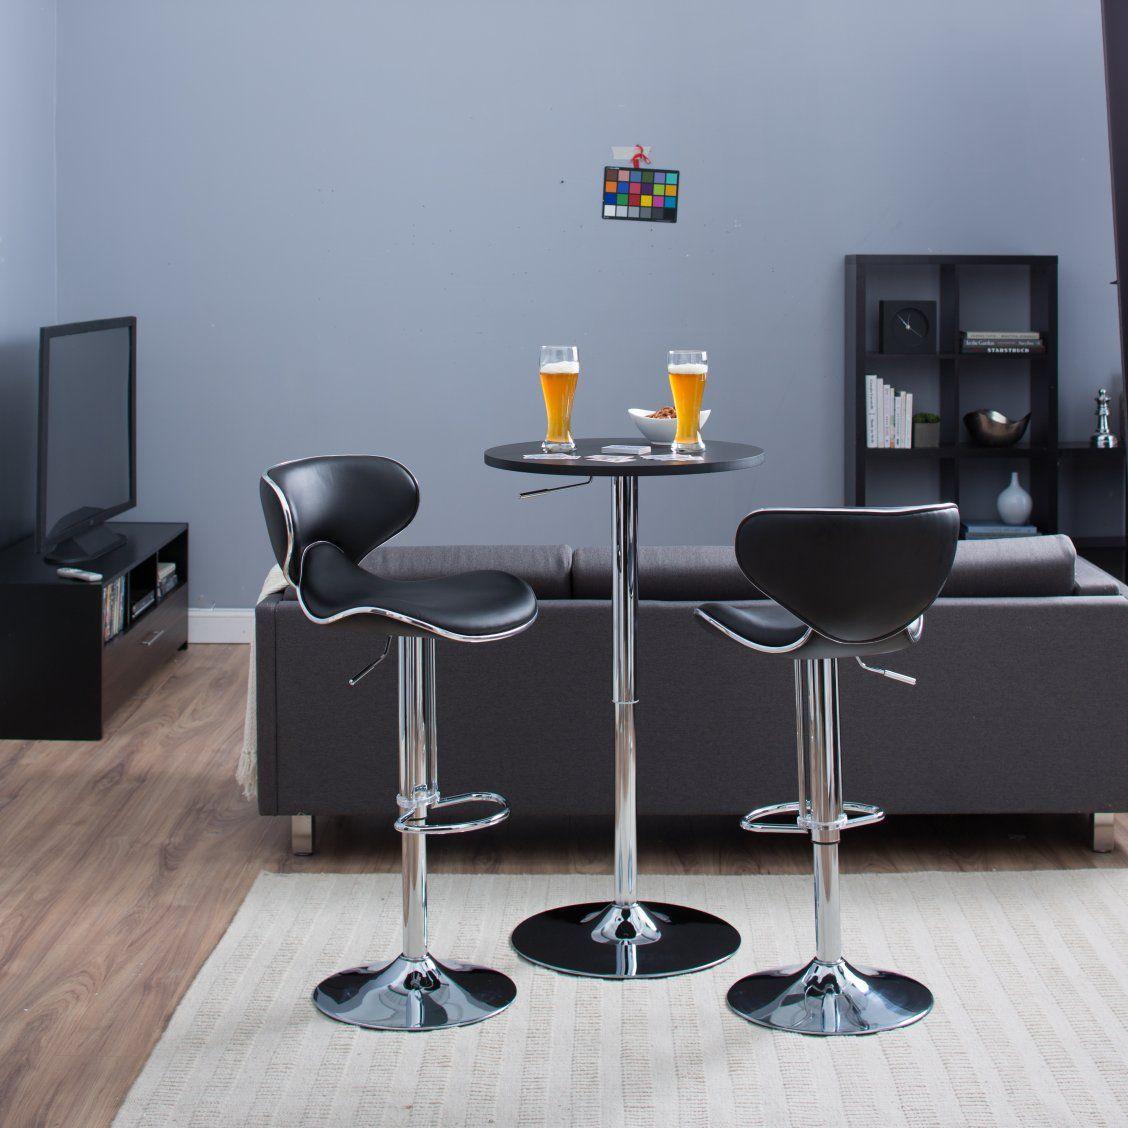 Wayfair Wedding Registry Bar stools, Stool, Swivel bar